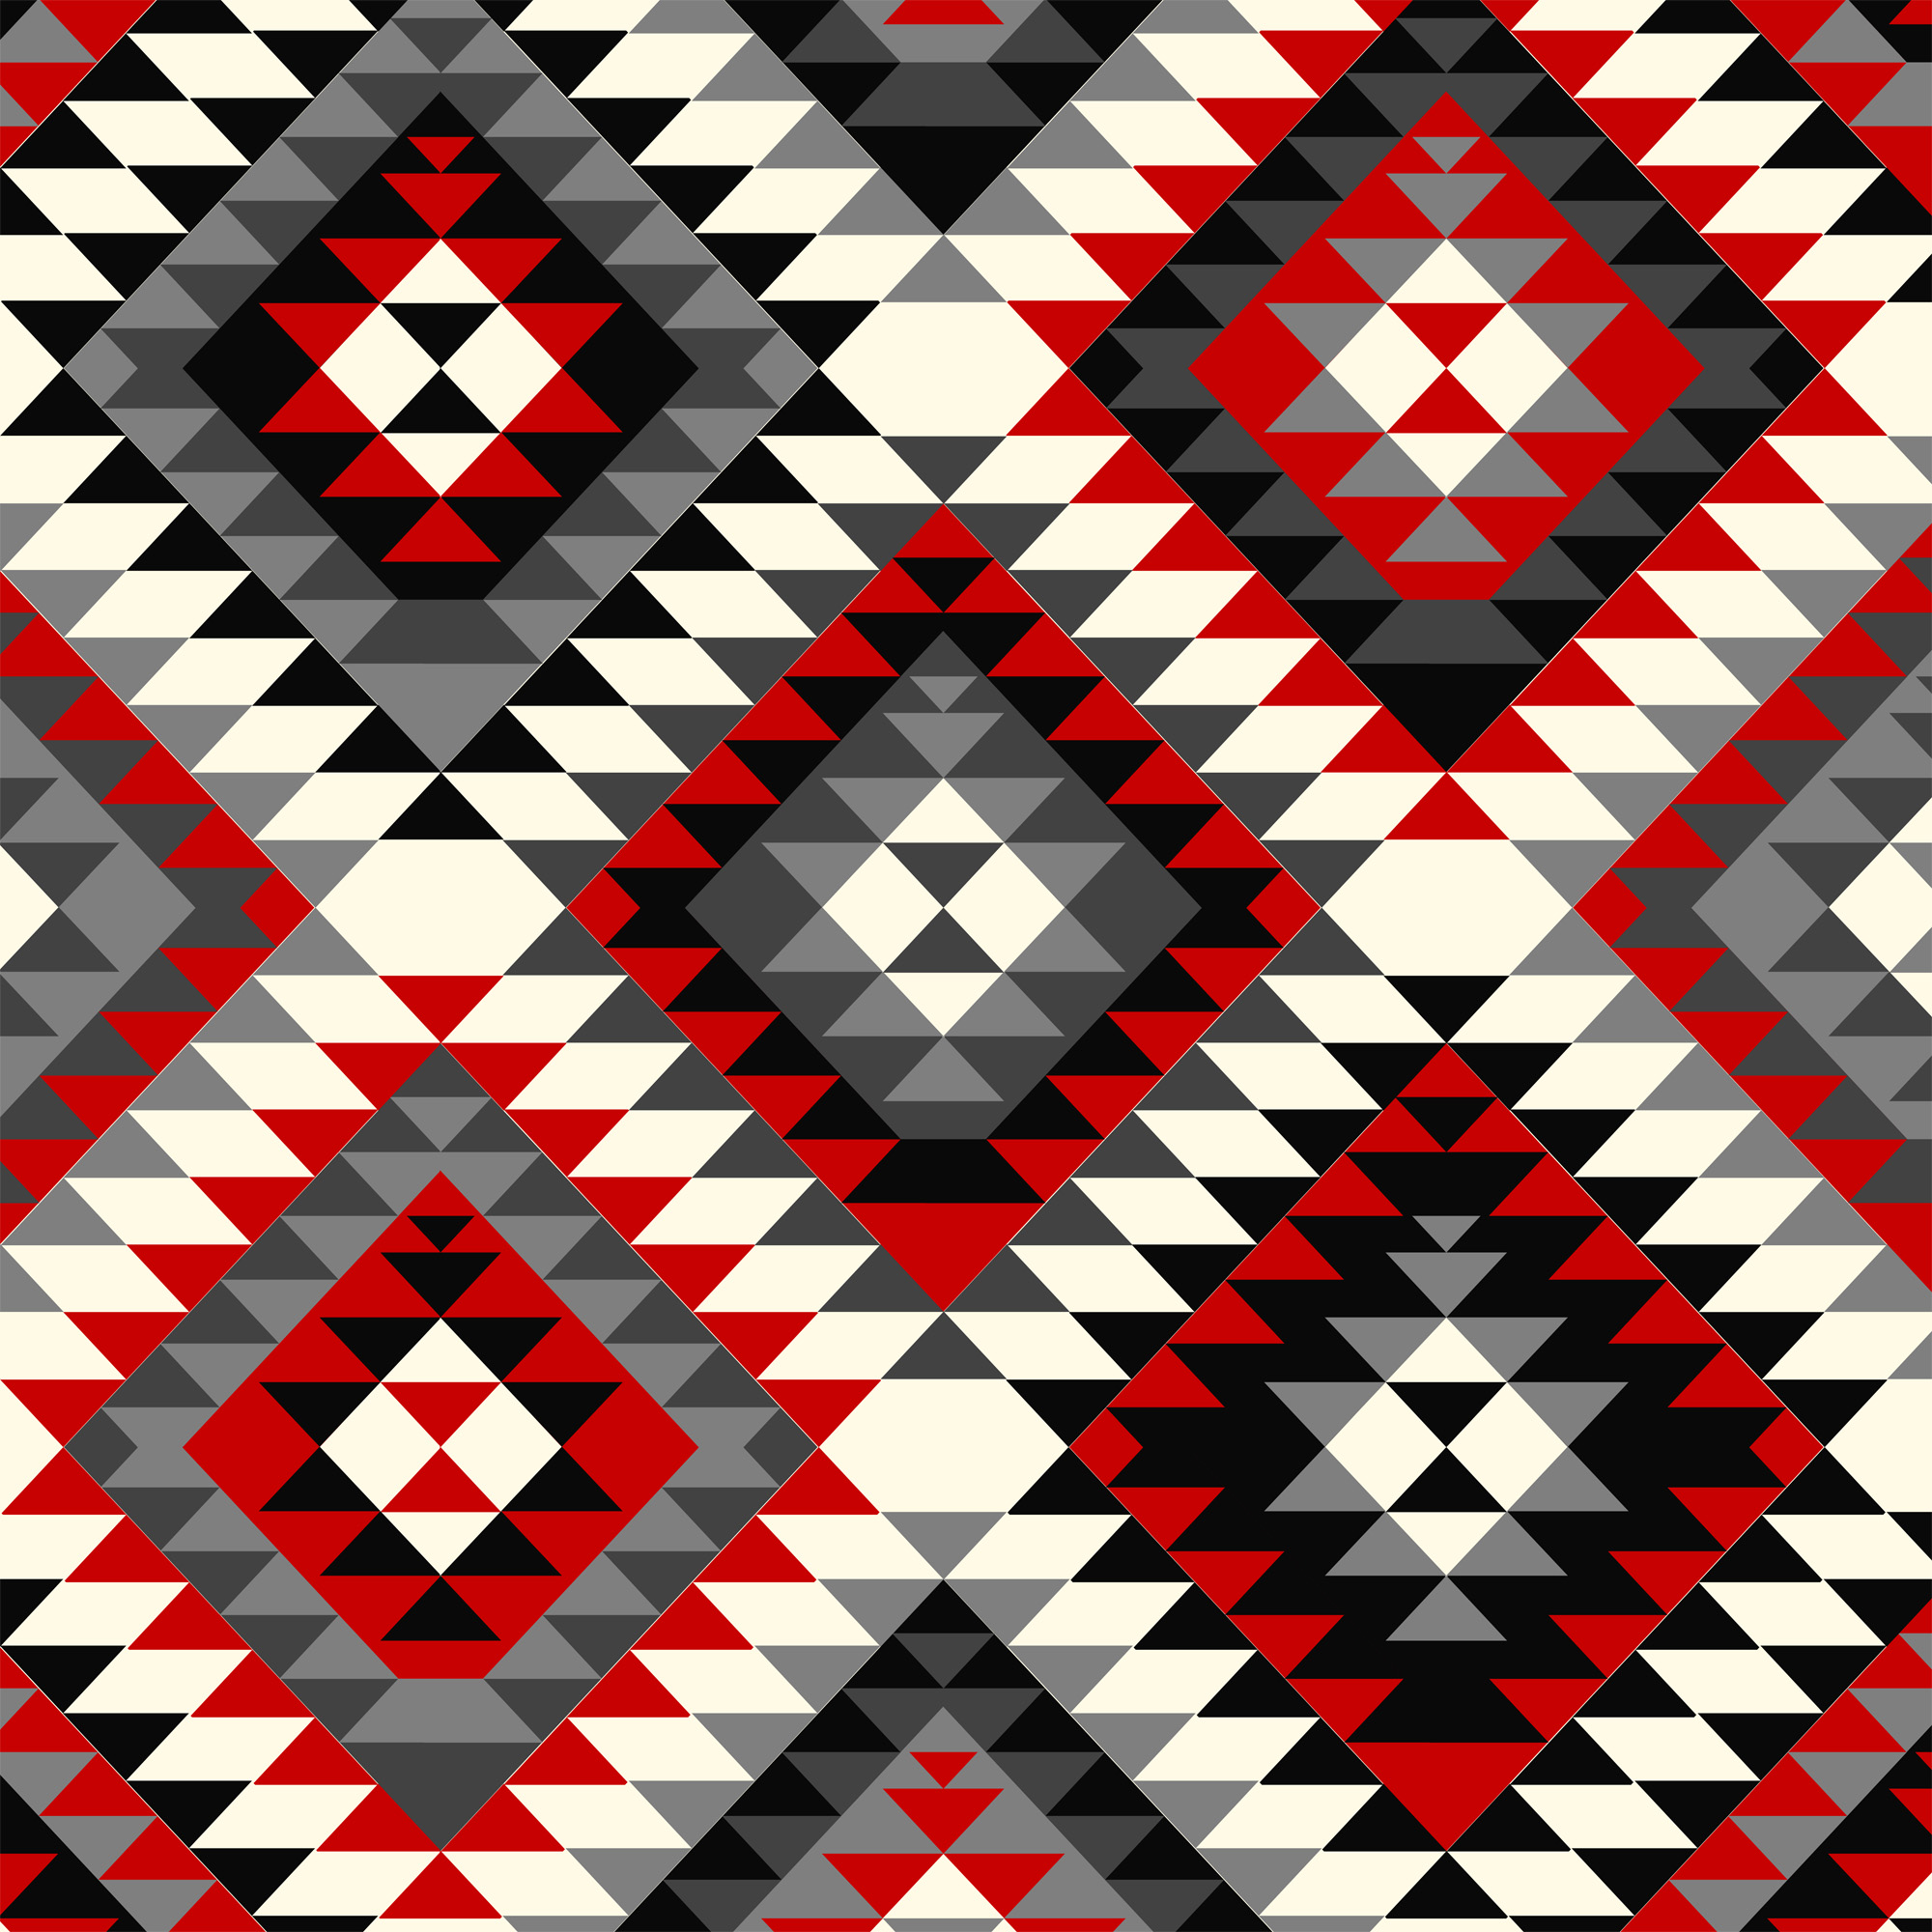 David Textiles Anti-Pill Fleece Native Diamonds Fabric, per Yard